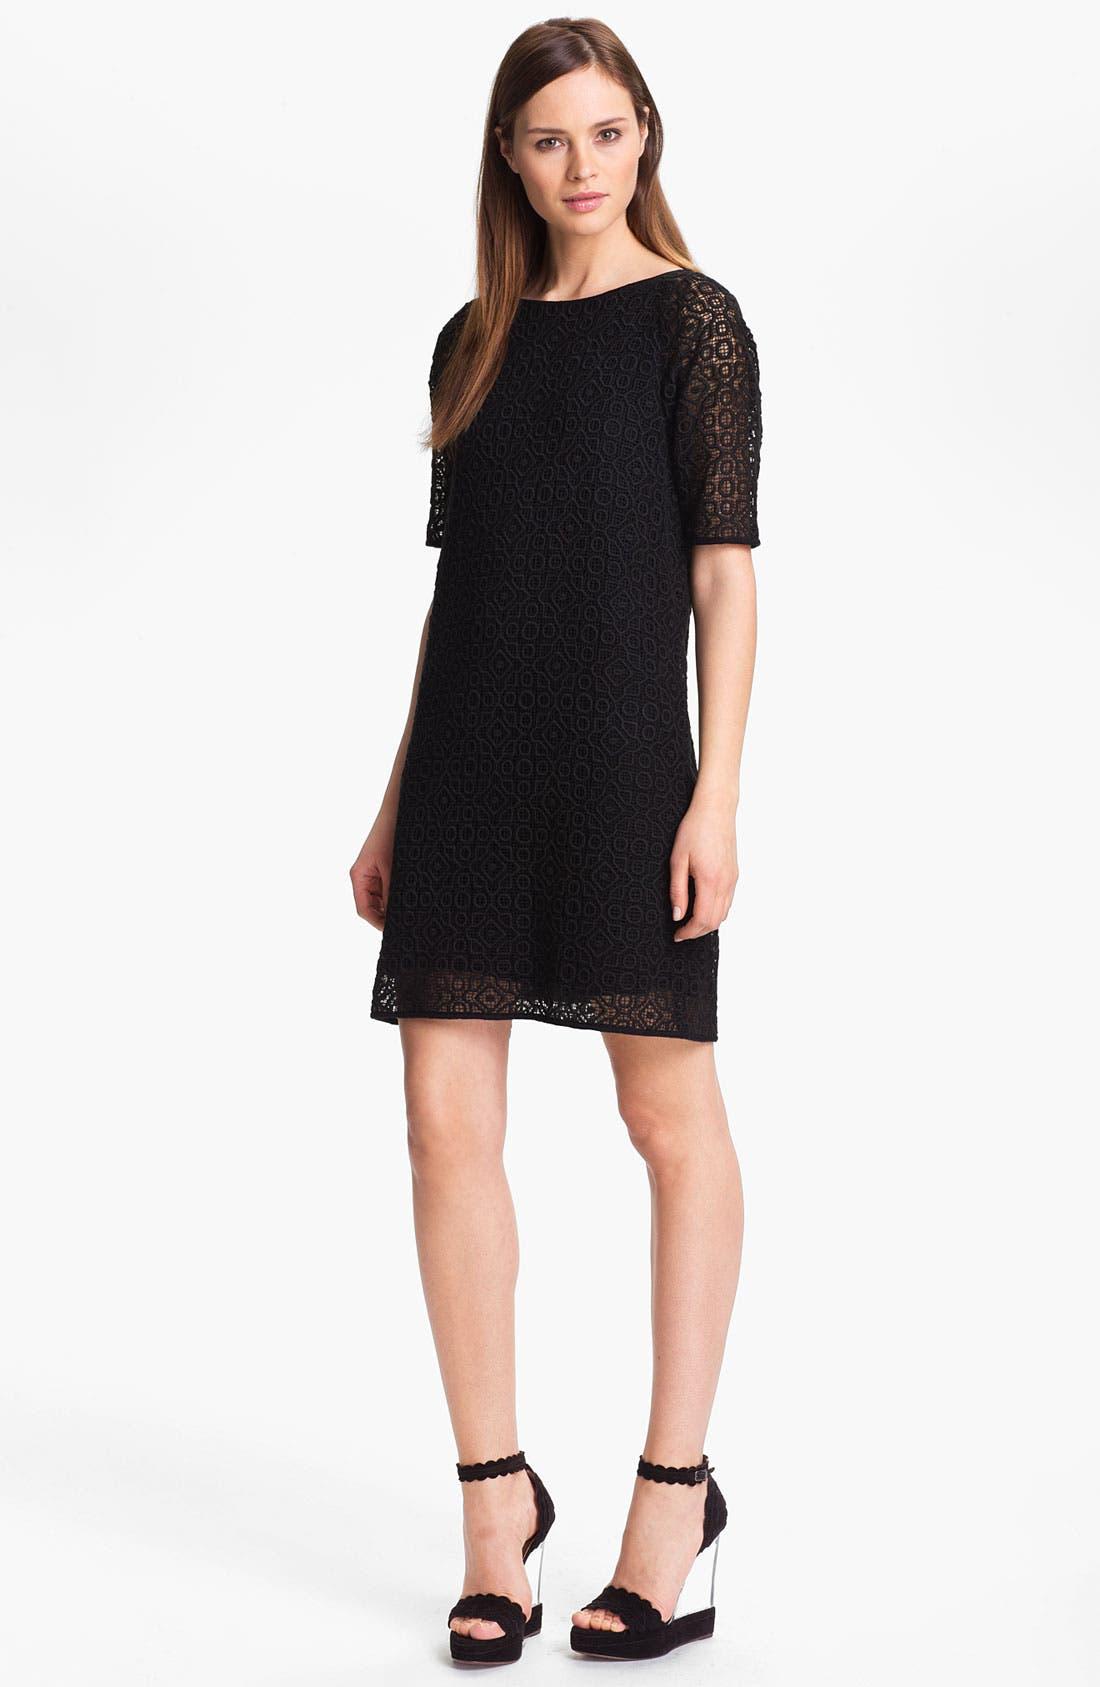 Alternate Image 1 Selected - Tibi Geometric Lace Dress